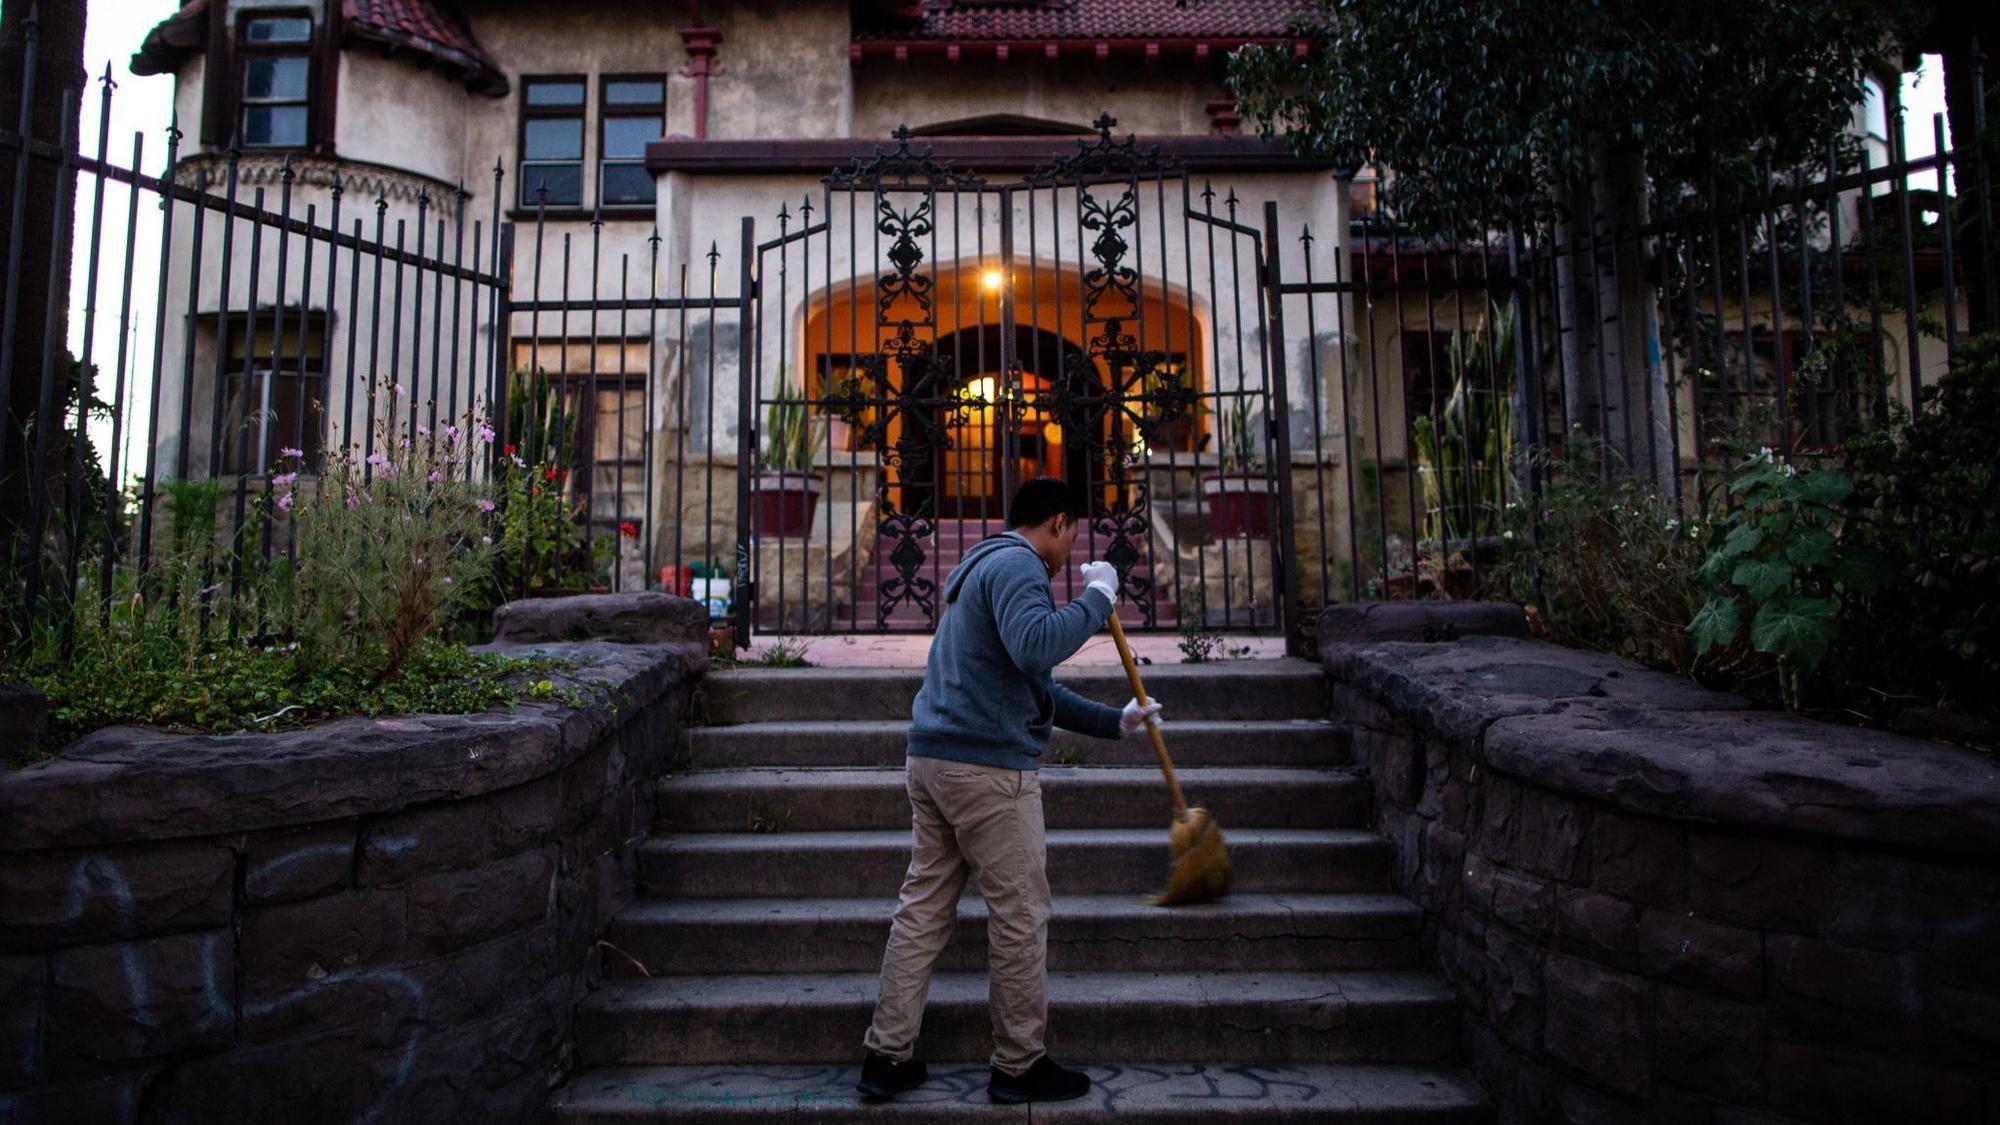 Casa Libre: State officials step up enforcement against L.A. group home for migrant children